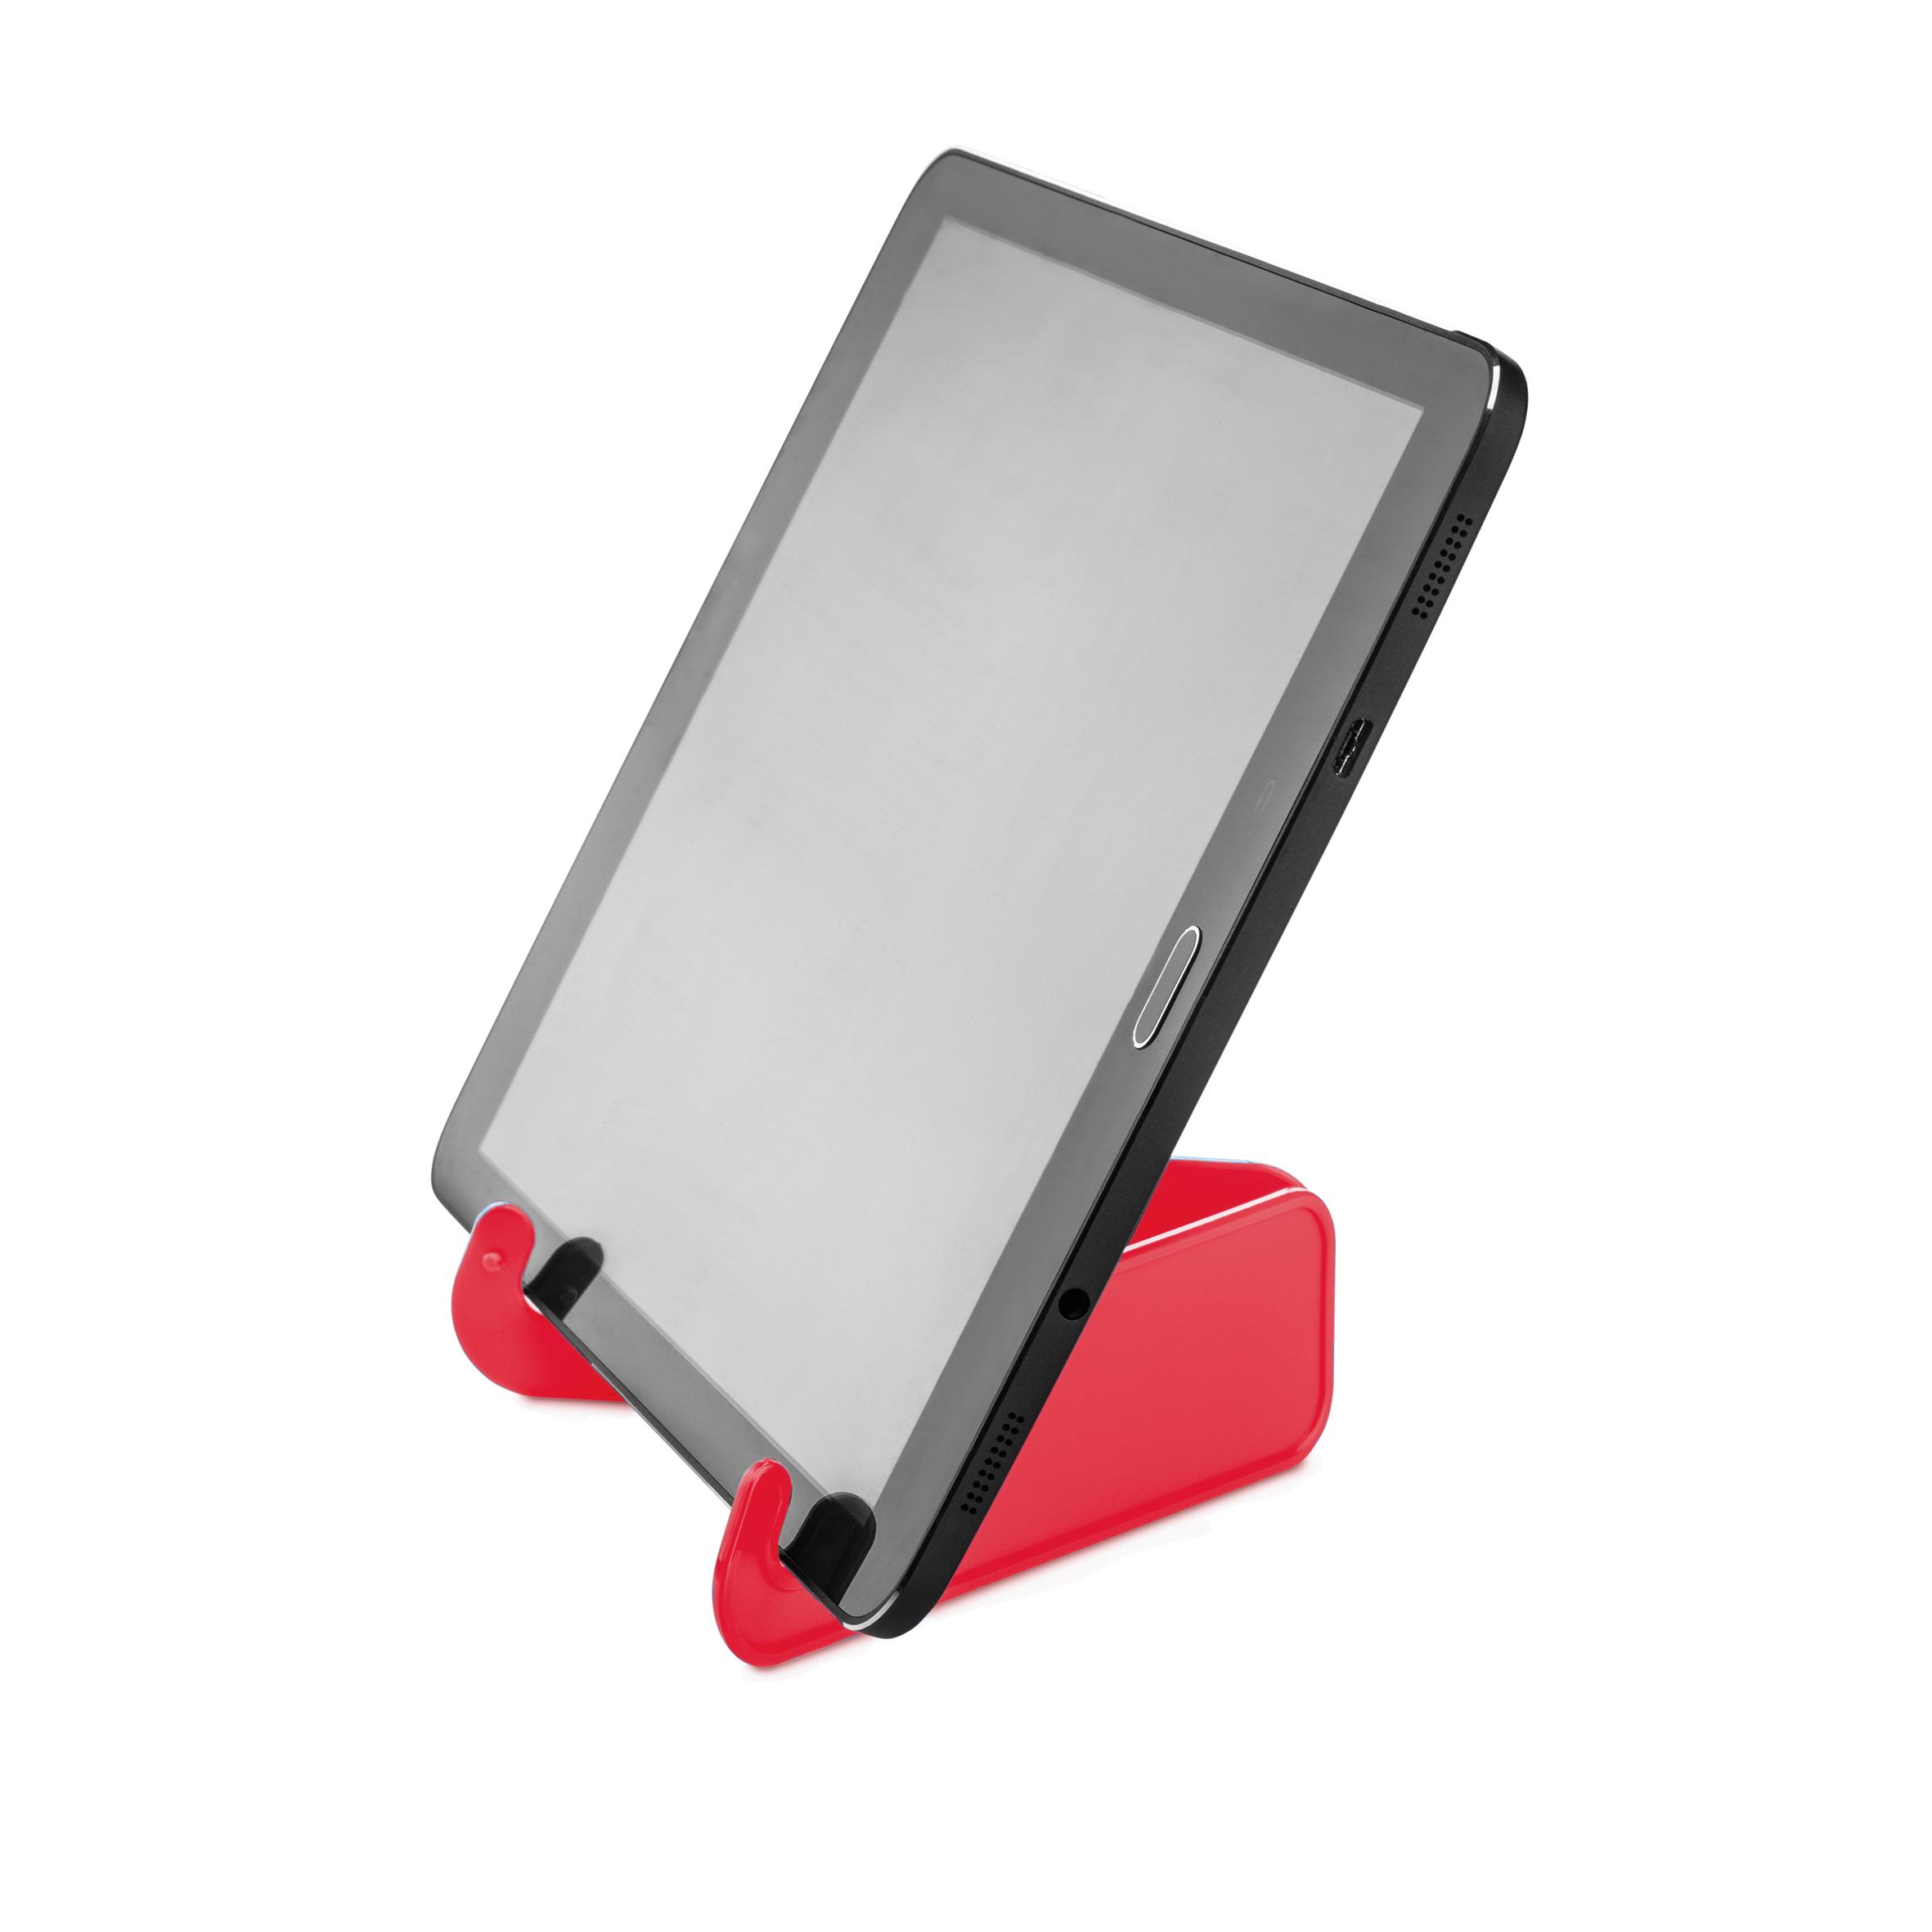 tablet halter ds24 tablet halter f r dji mavic pro tablet holder neigbarer ipad medienst nder. Black Bedroom Furniture Sets. Home Design Ideas